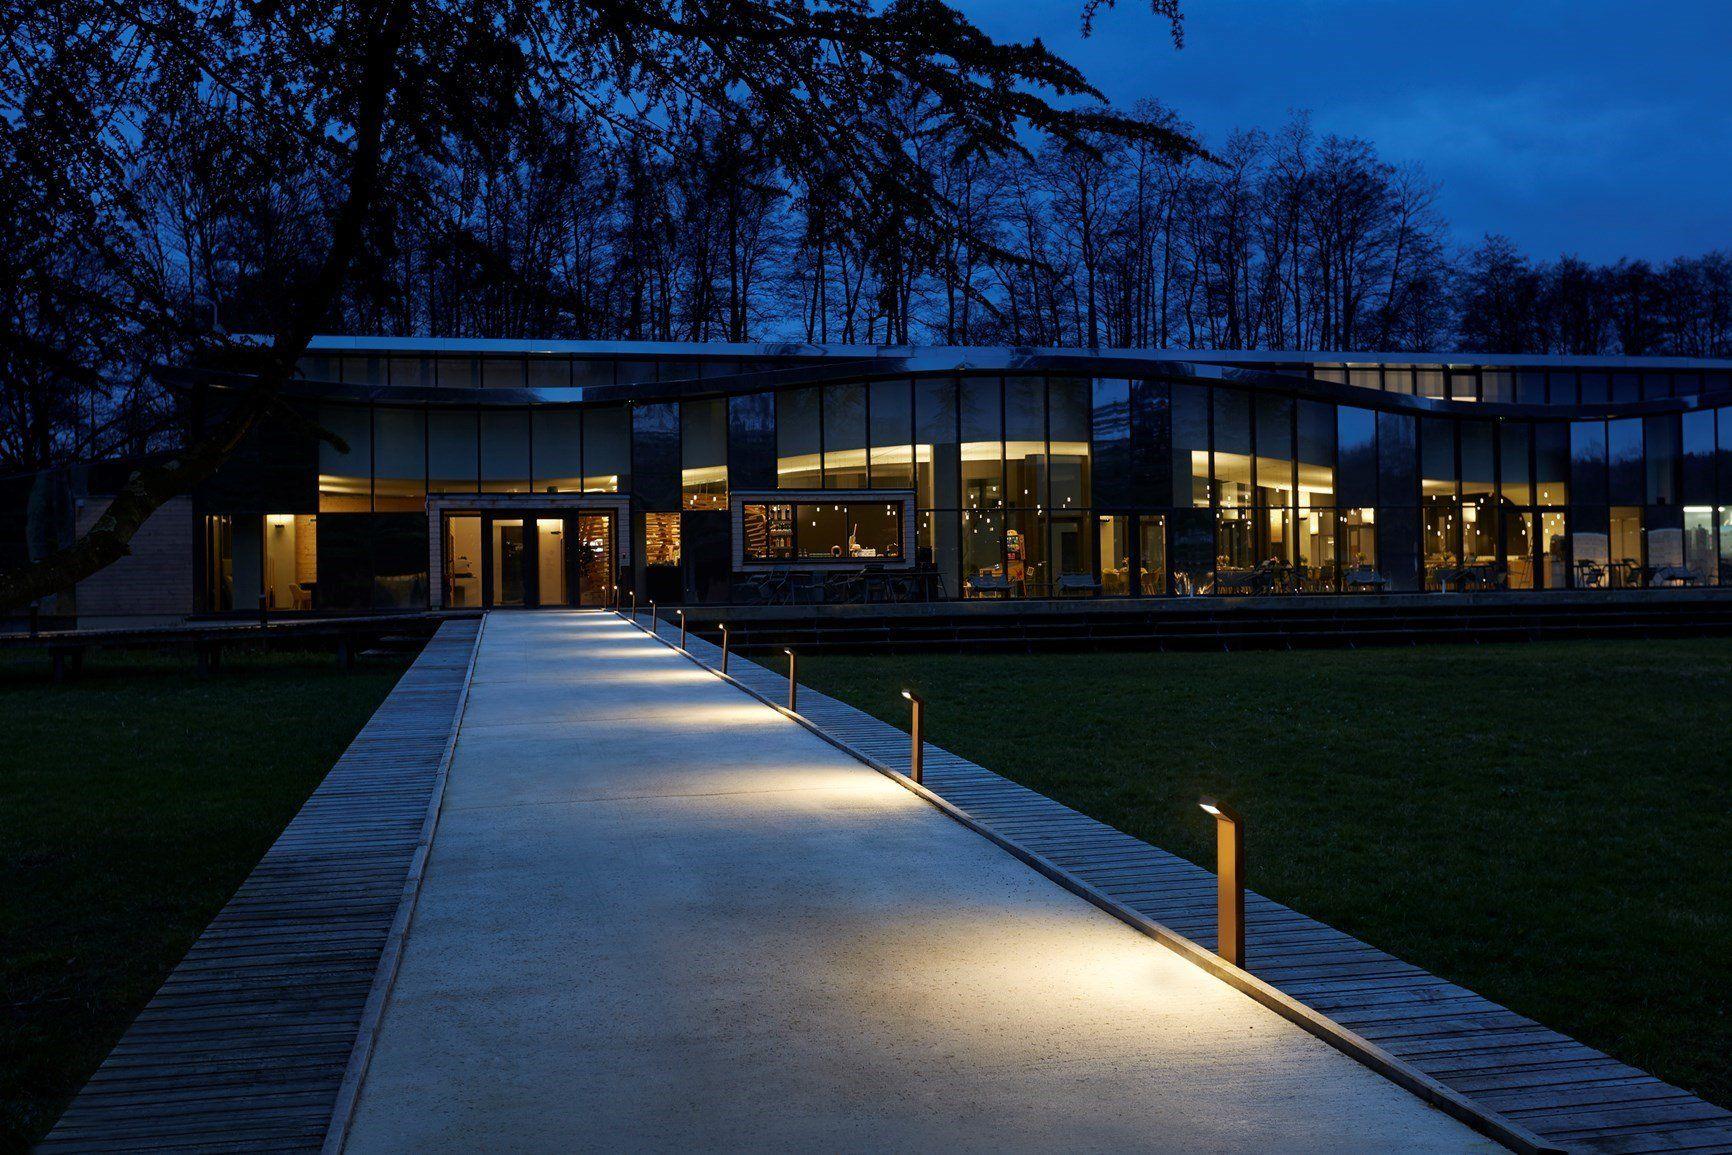 L l luce light illumina il campus pernod ricard university